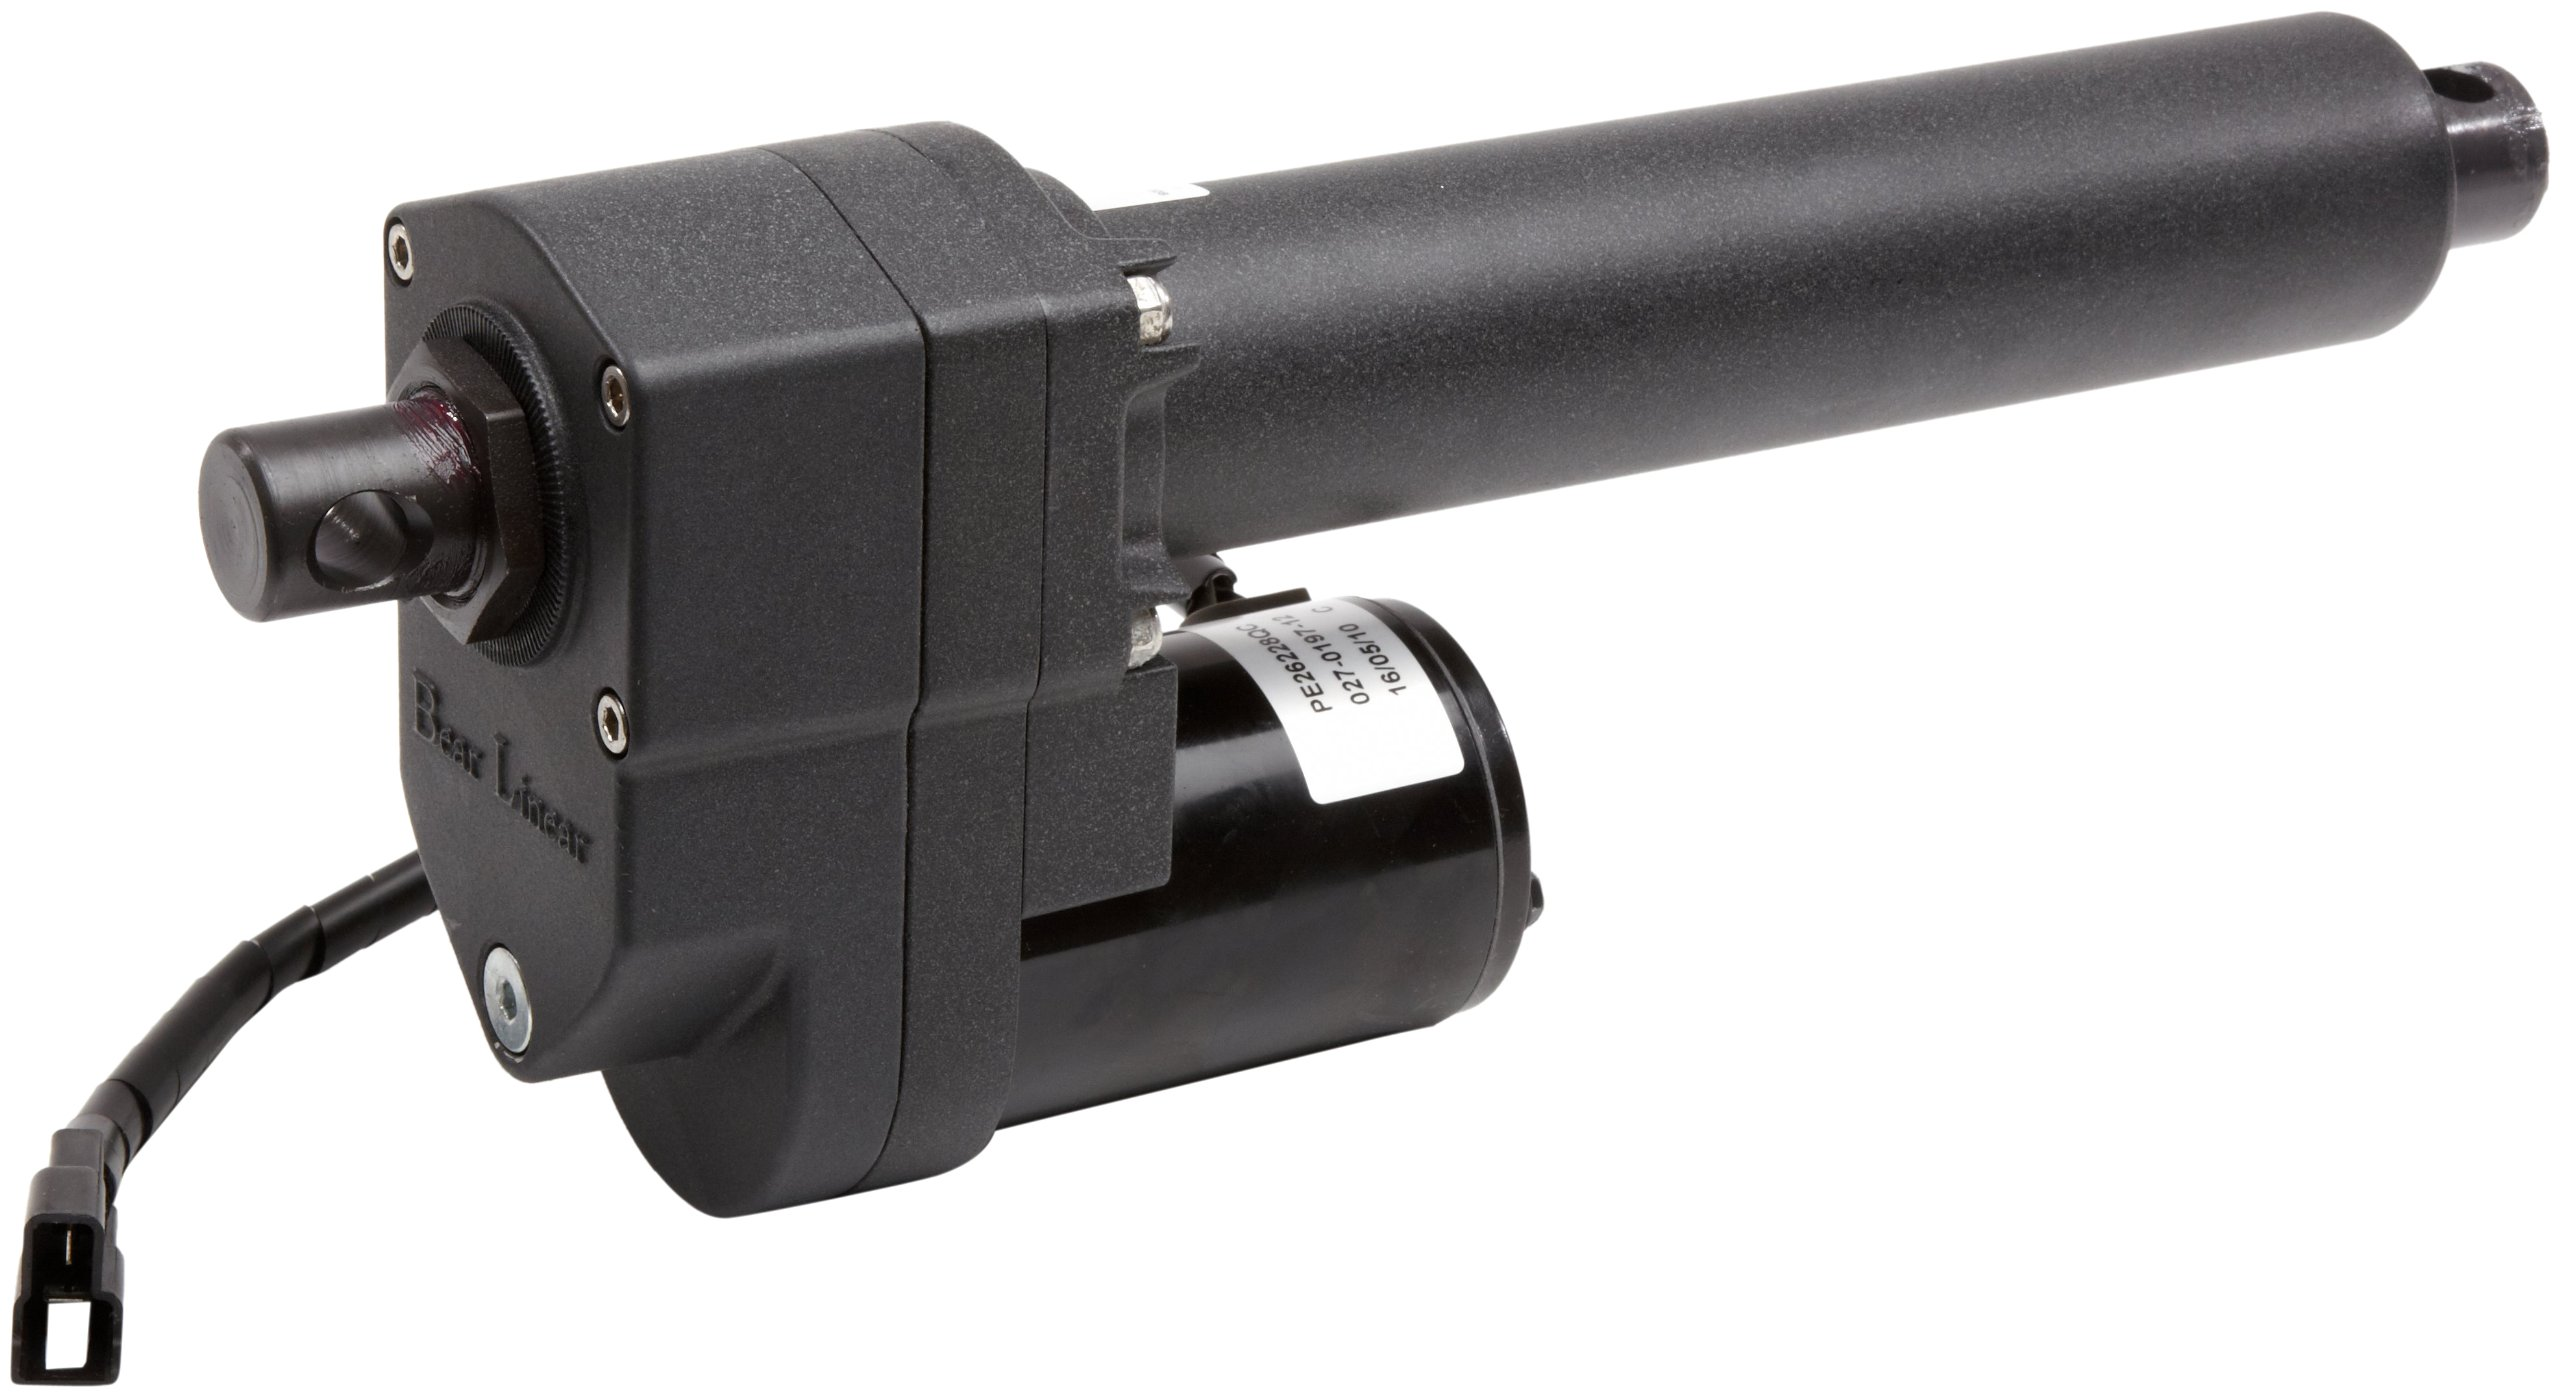 Warner Linear K2xG20-12v-06 B-Track K2 6'' Stroke Length Rugged Duty Actuator